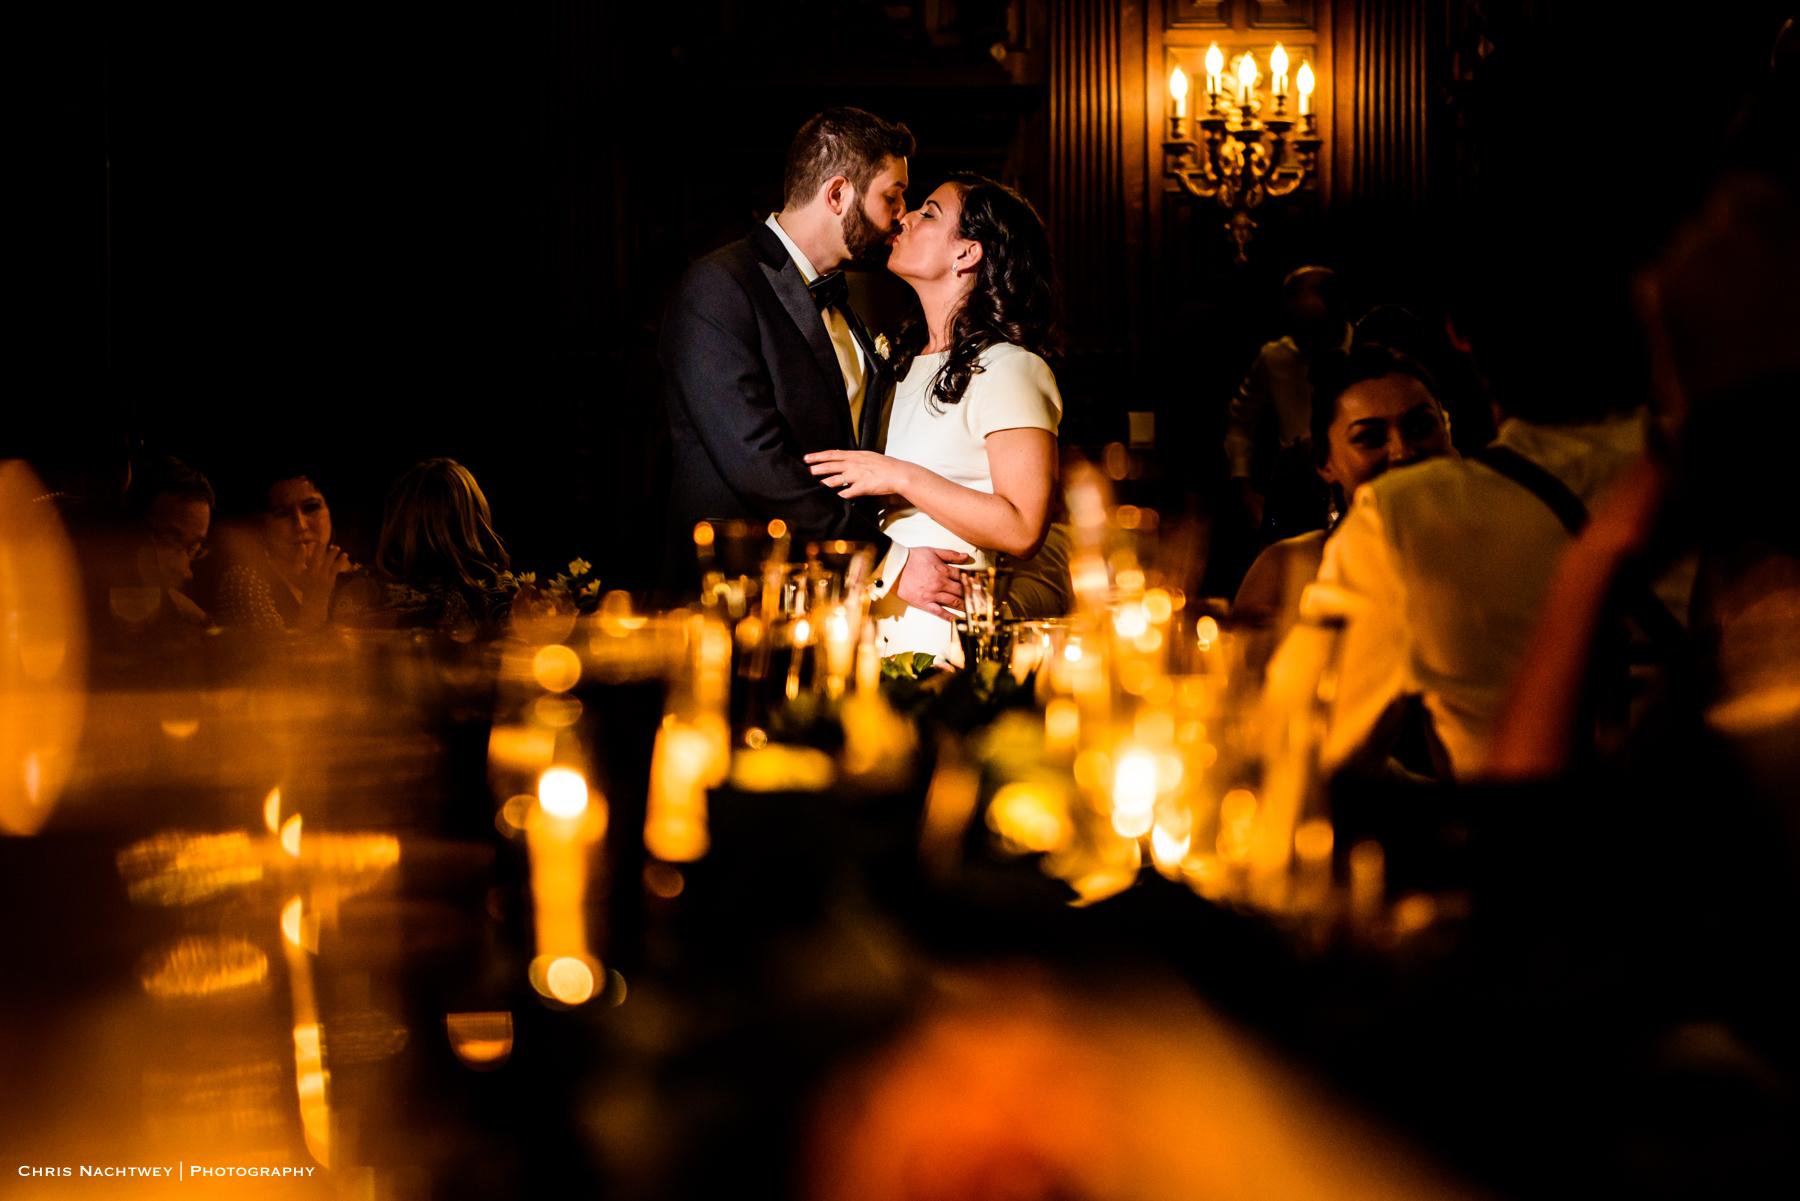 winter-branford-house-wedding-photos-groton-ct-chris-nachtwey-photography-2019-41.jpg